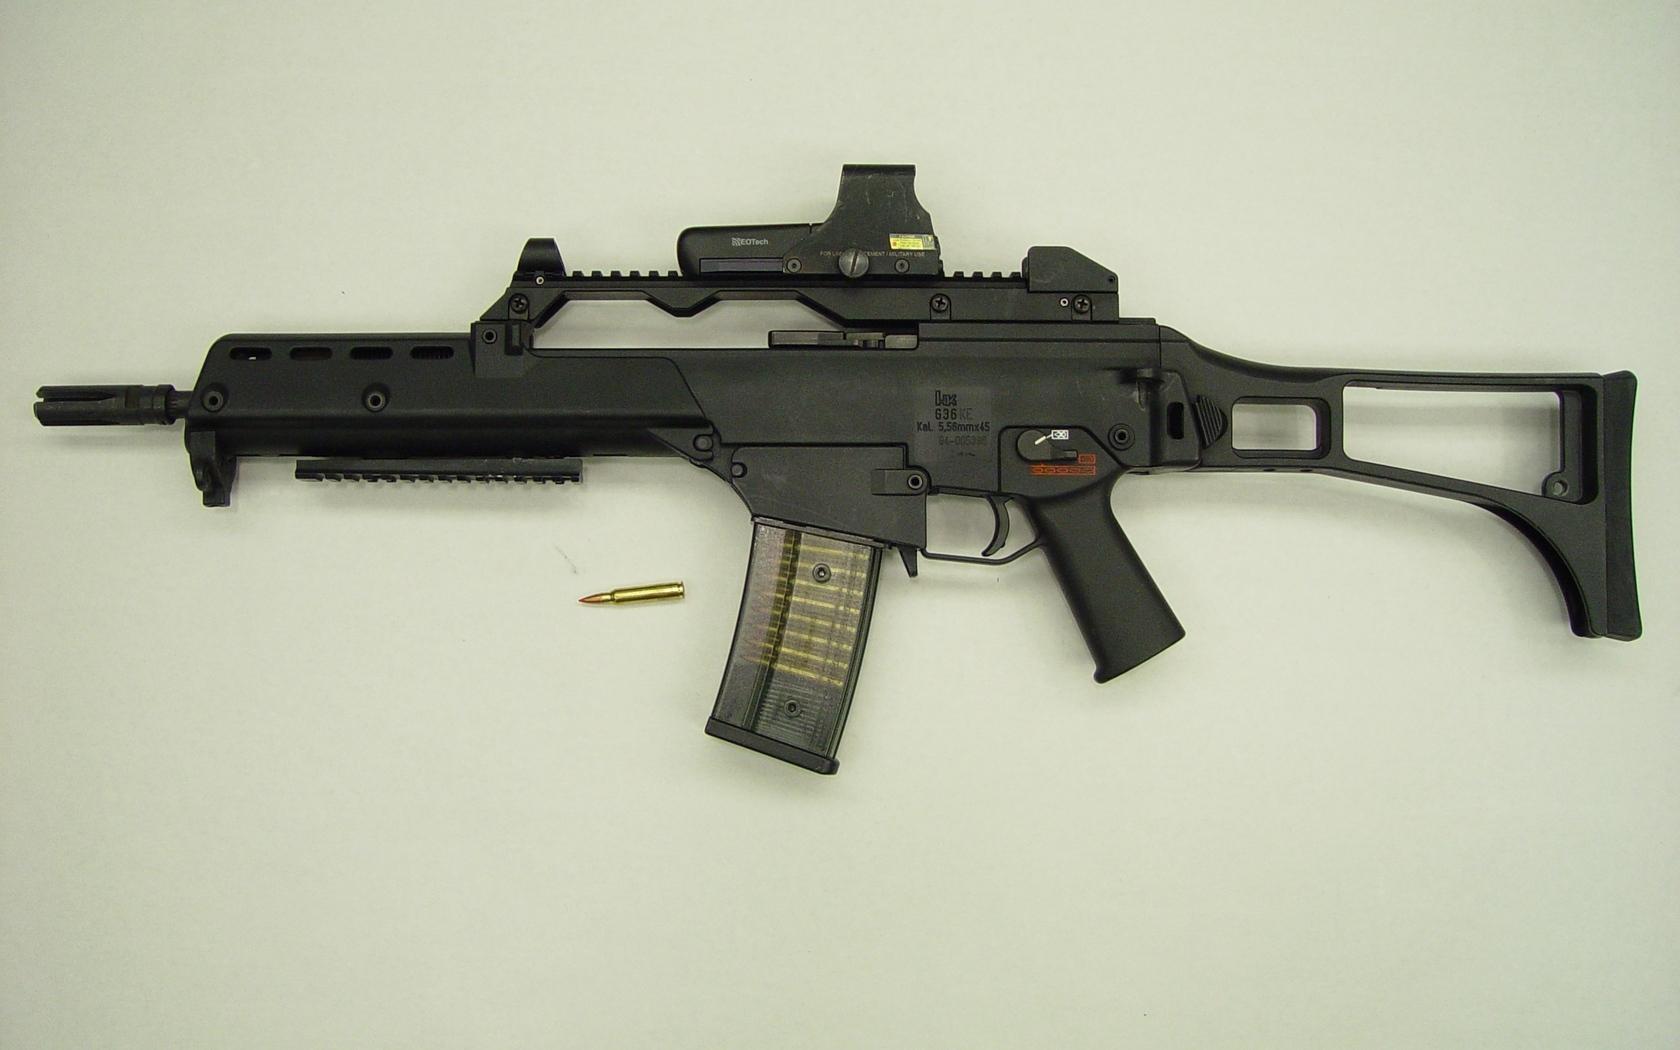 Guns Wallpaper Hd Spring G3 Rifle Wallpapers 1680x1050 496031